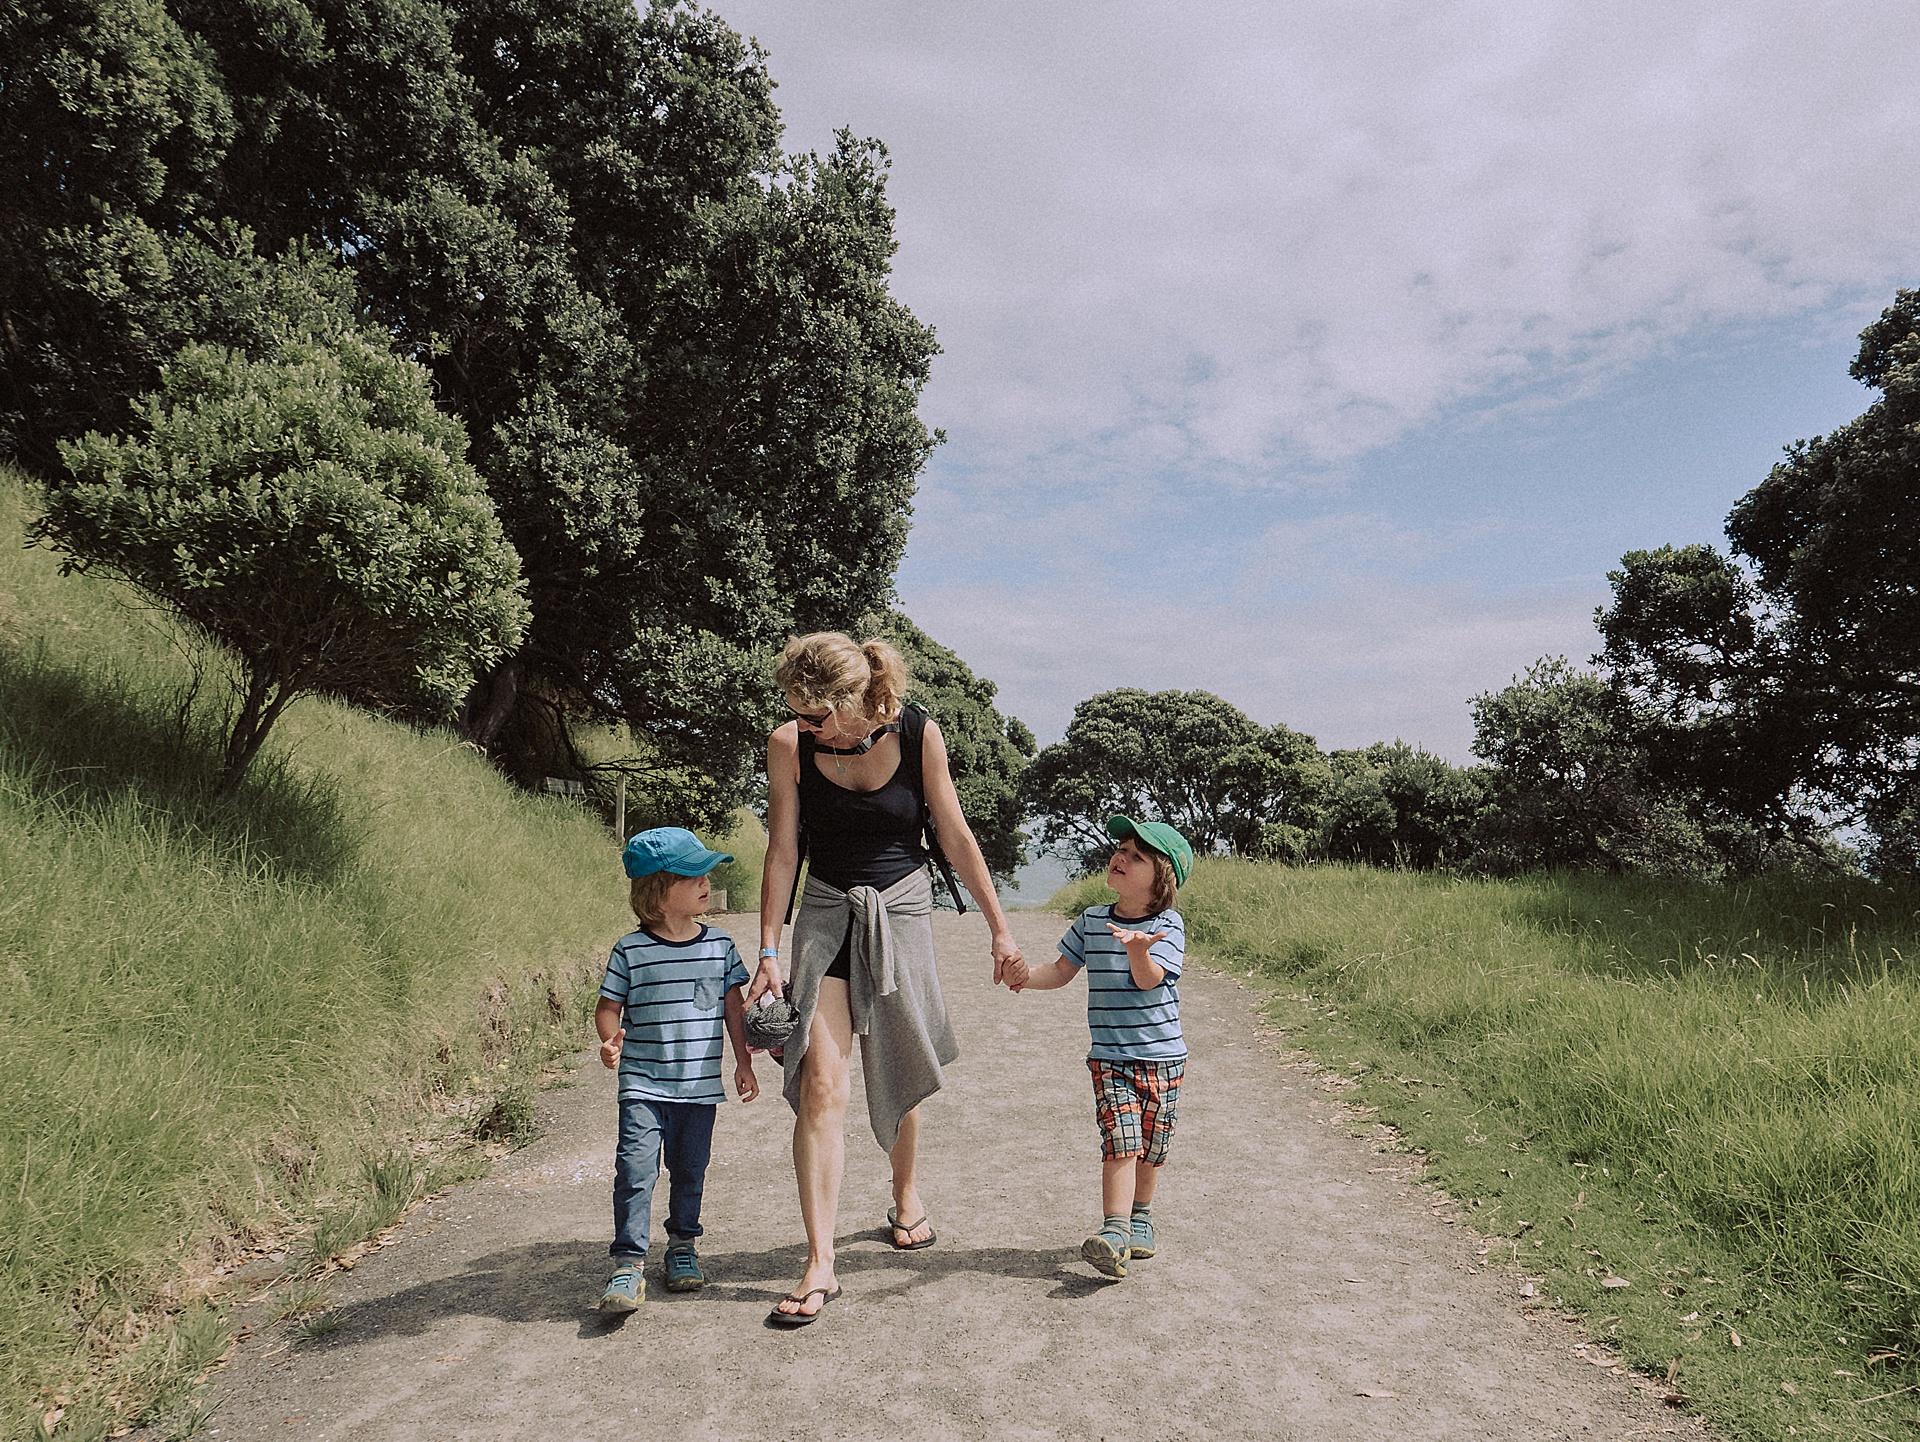 family-roadtrip-neuseeland-travelnewzealand-danielzube_0640.jpg